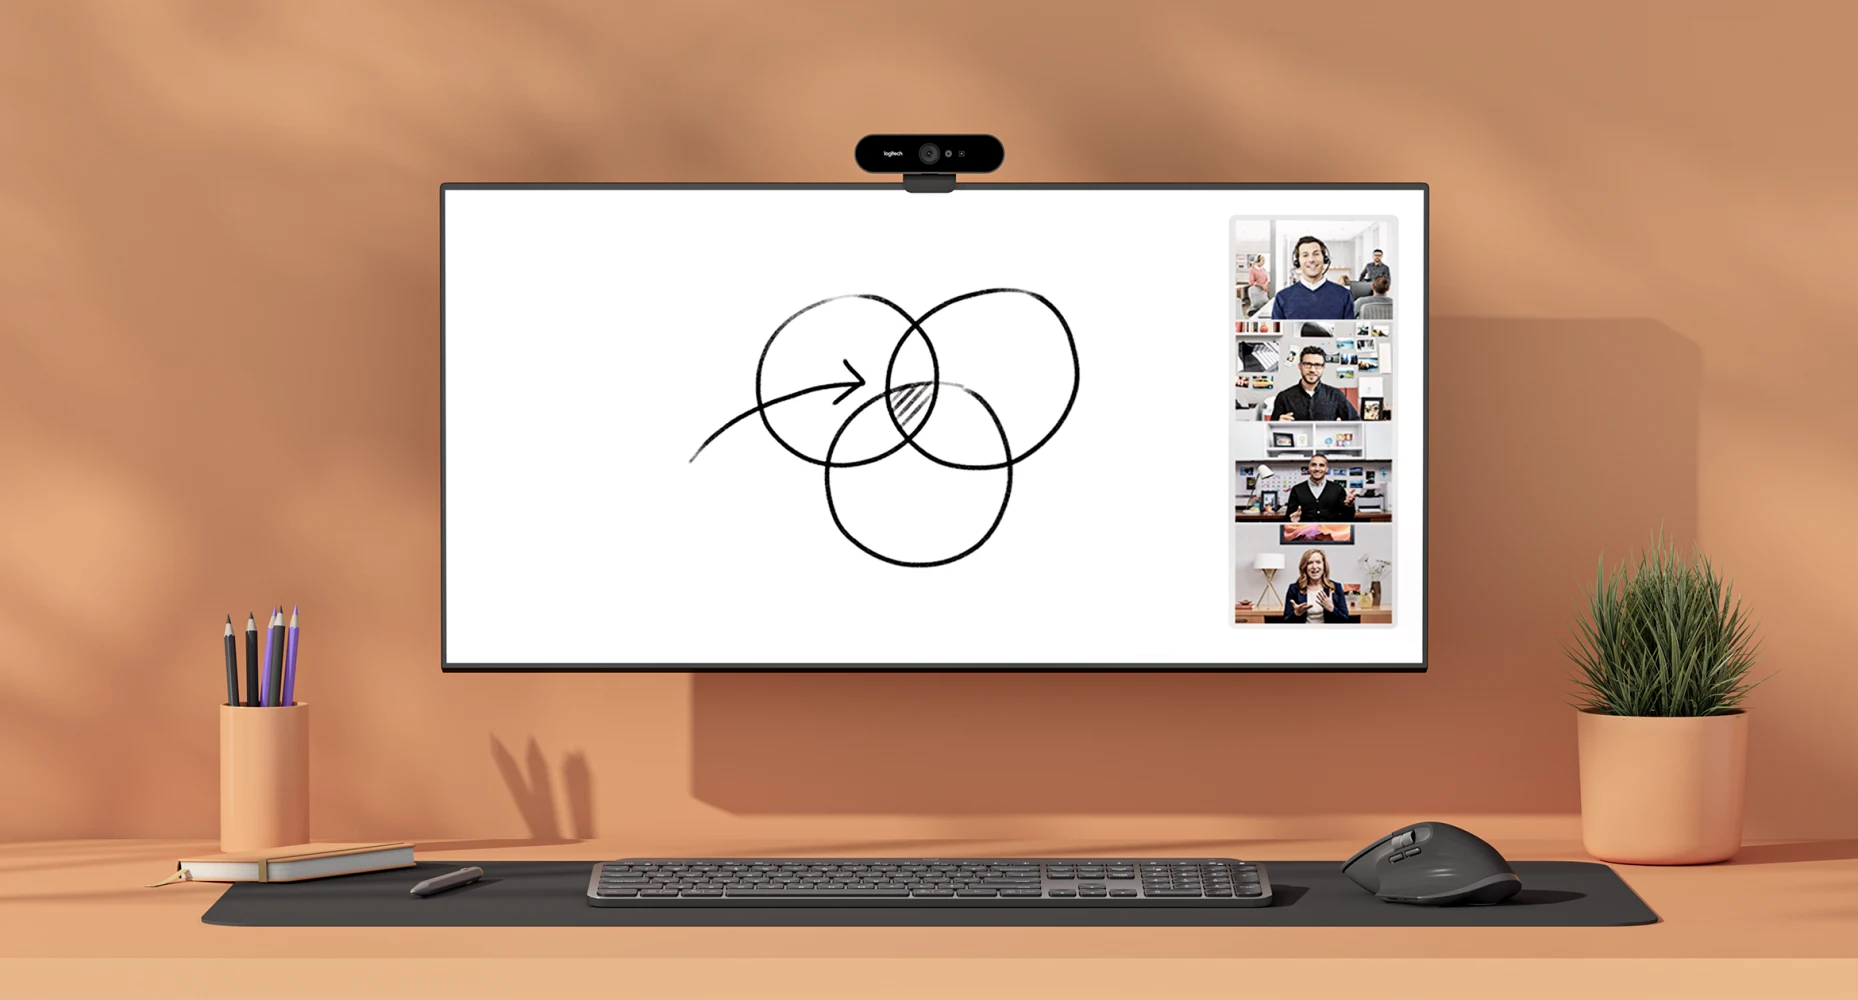 scribe-perfect-view-2-desktop-v4 copy